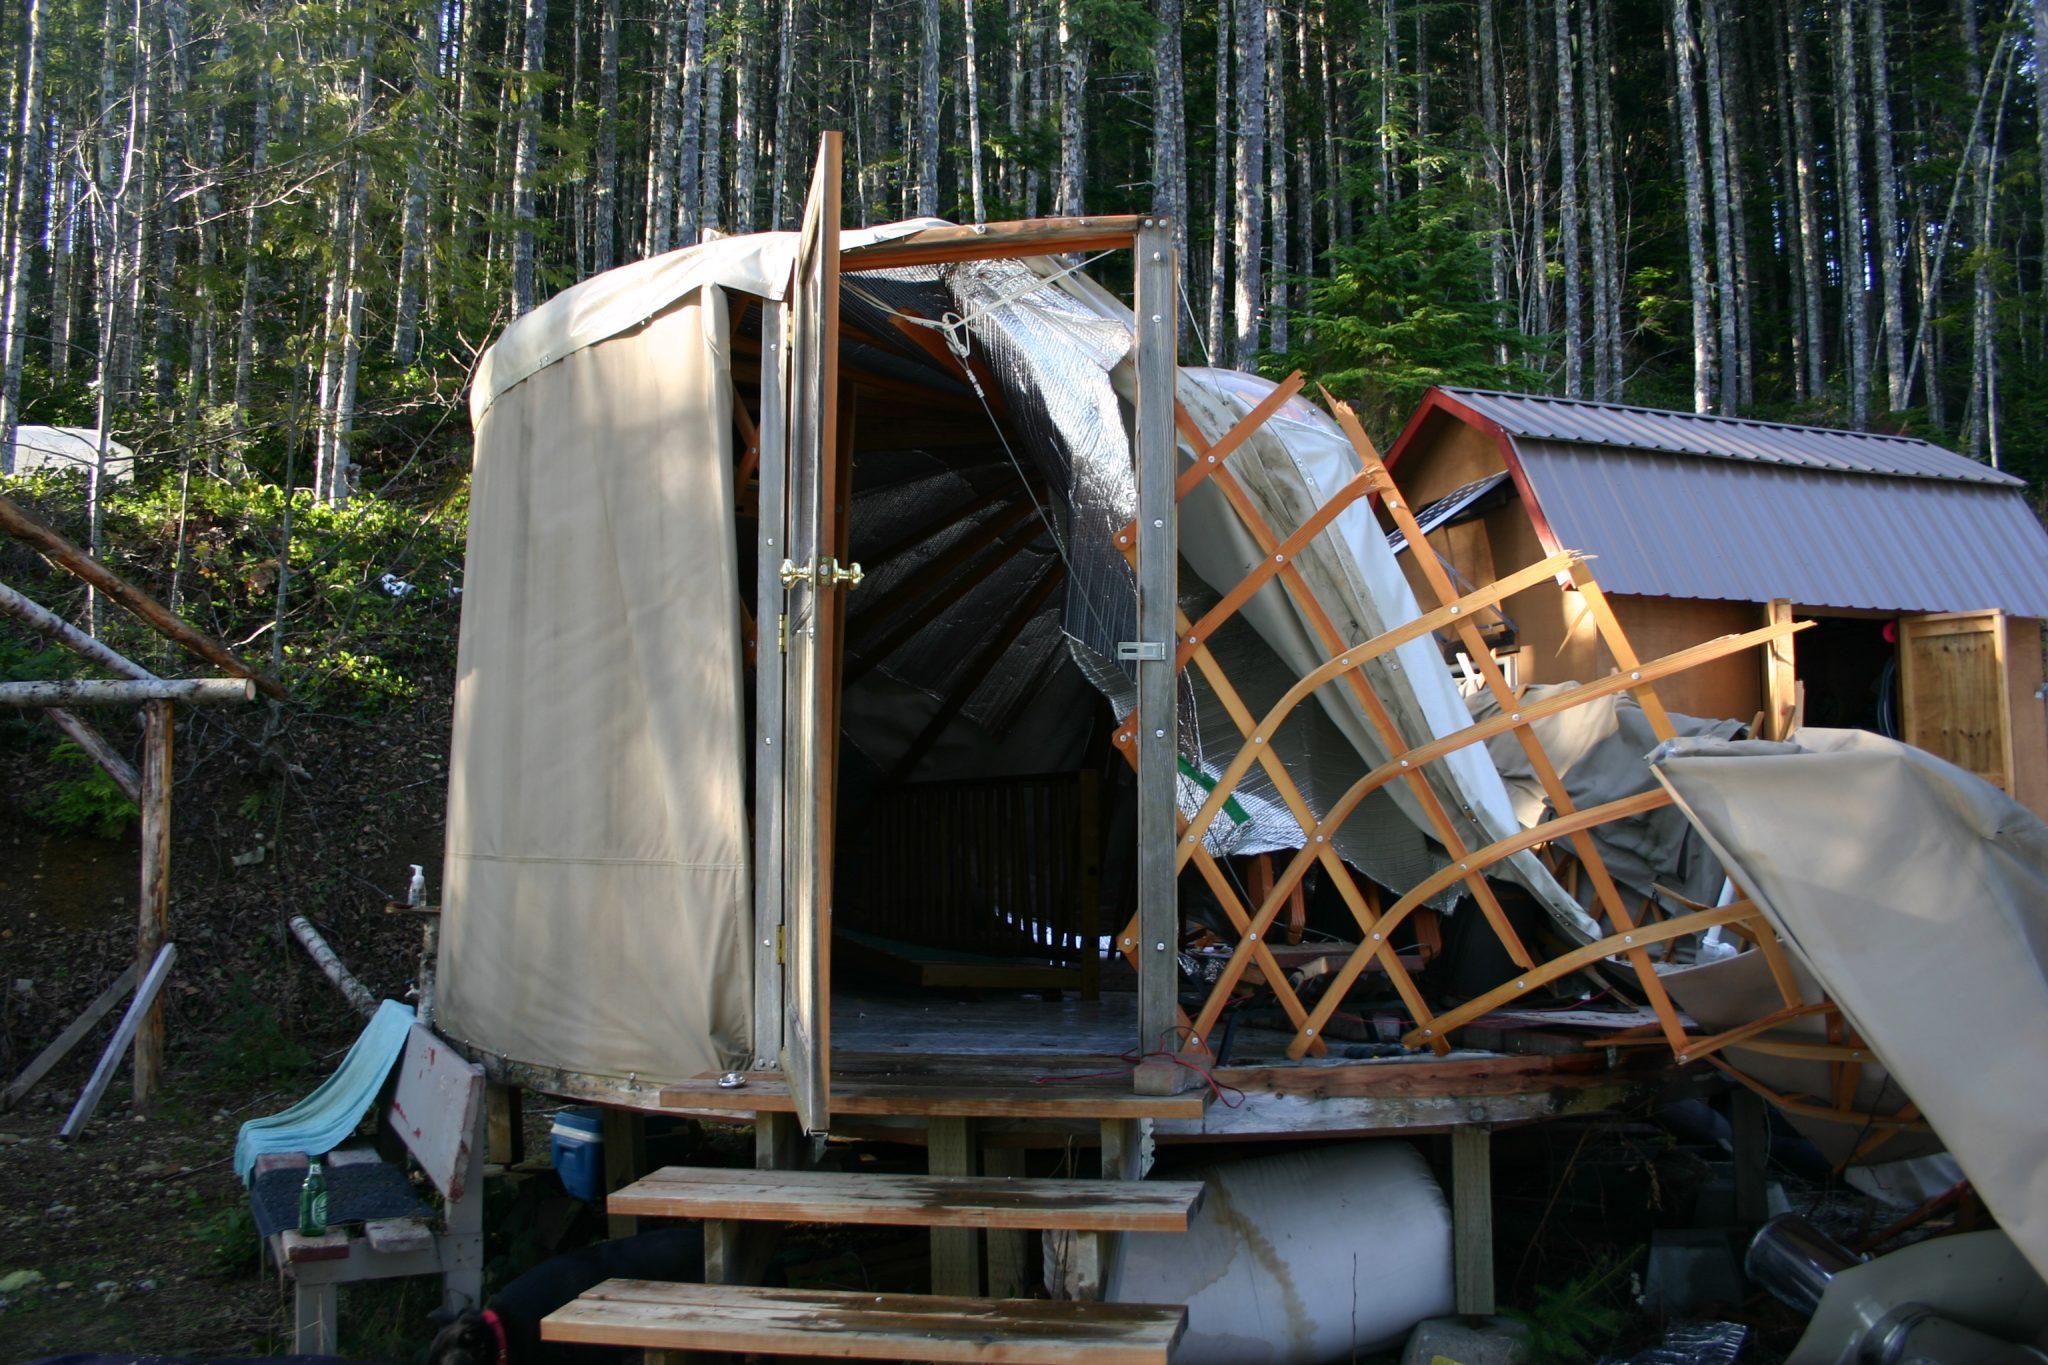 Collapsed Yurt